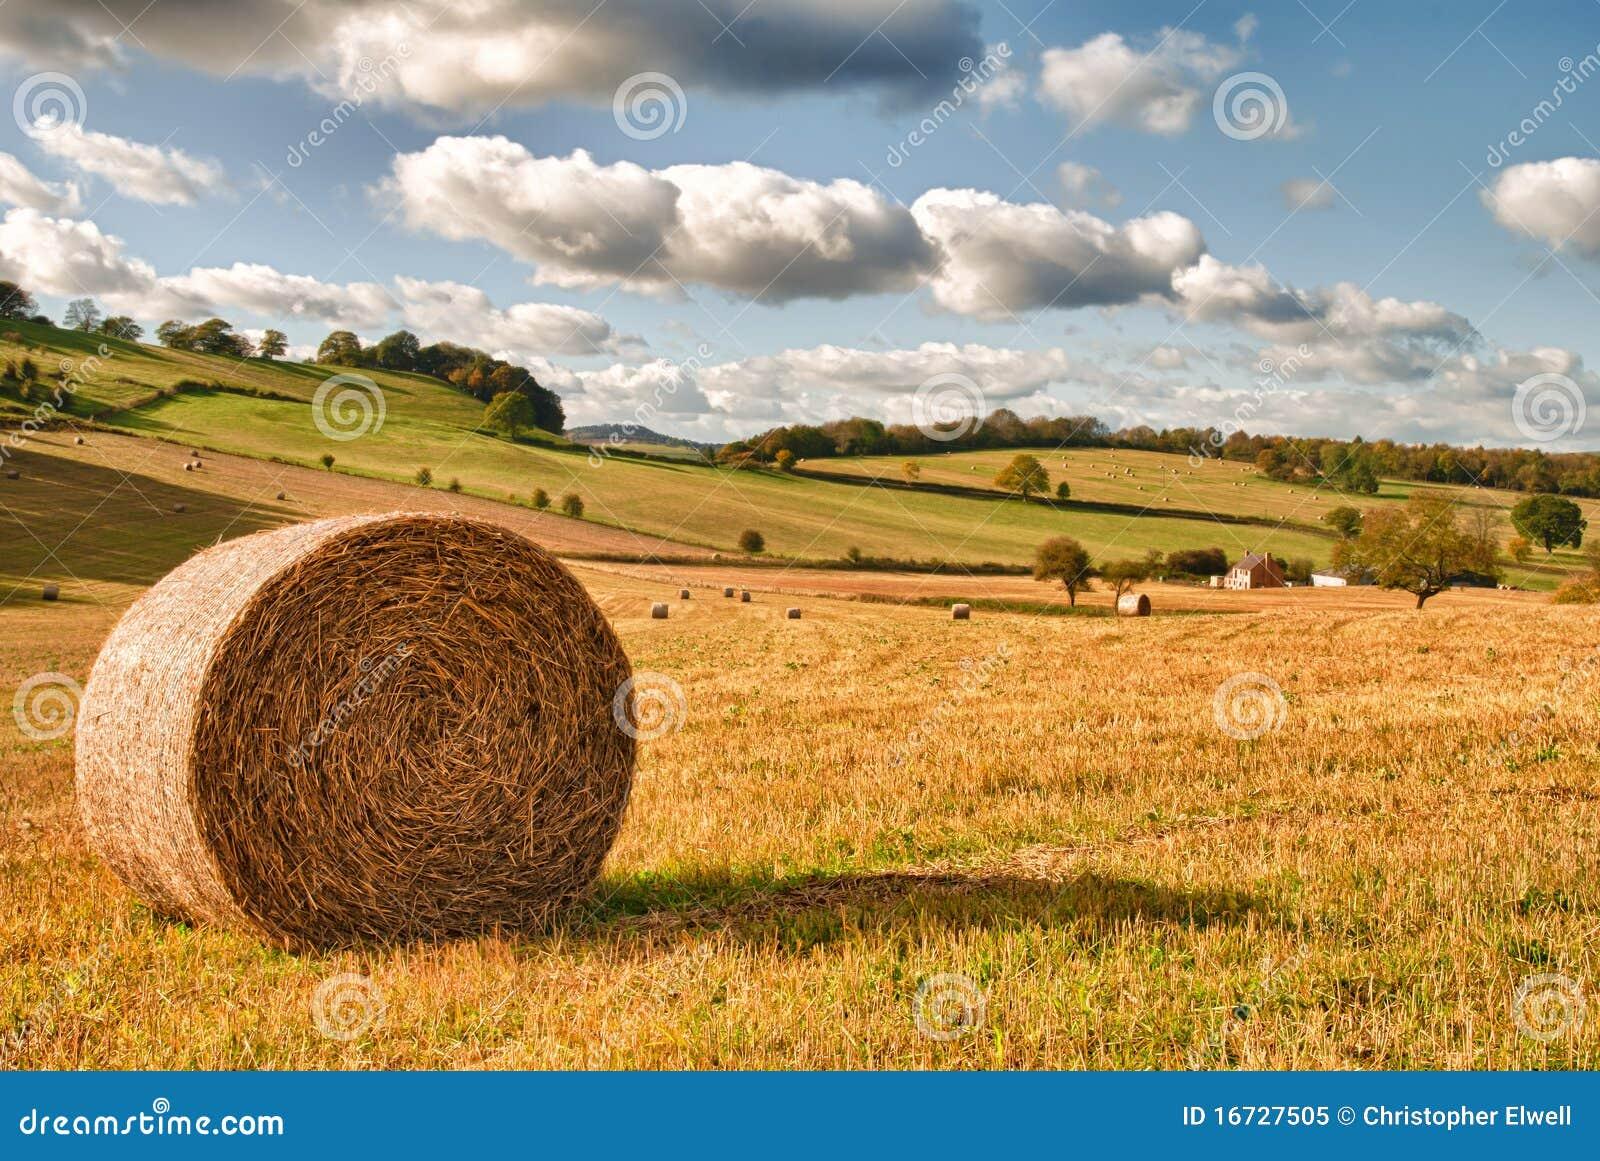 Perfect Harvest Landscape